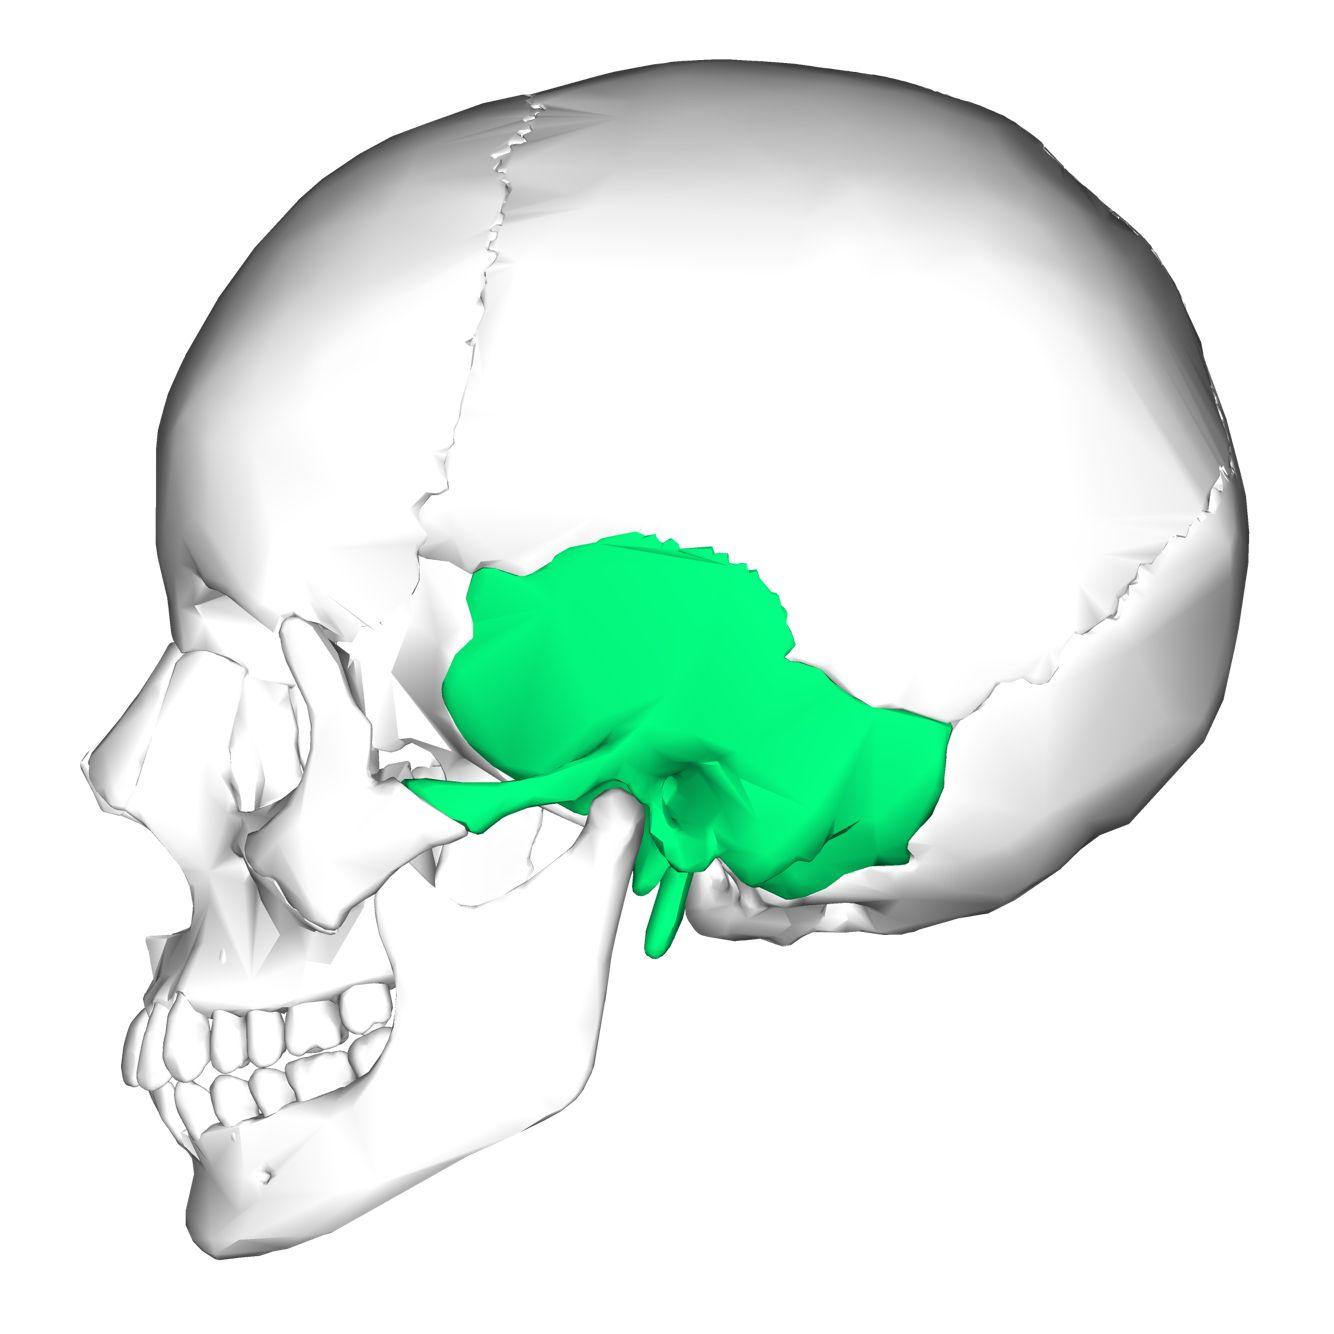 temporal bone : 2 bones , these bones with sphenoid bone make part, Sphenoid